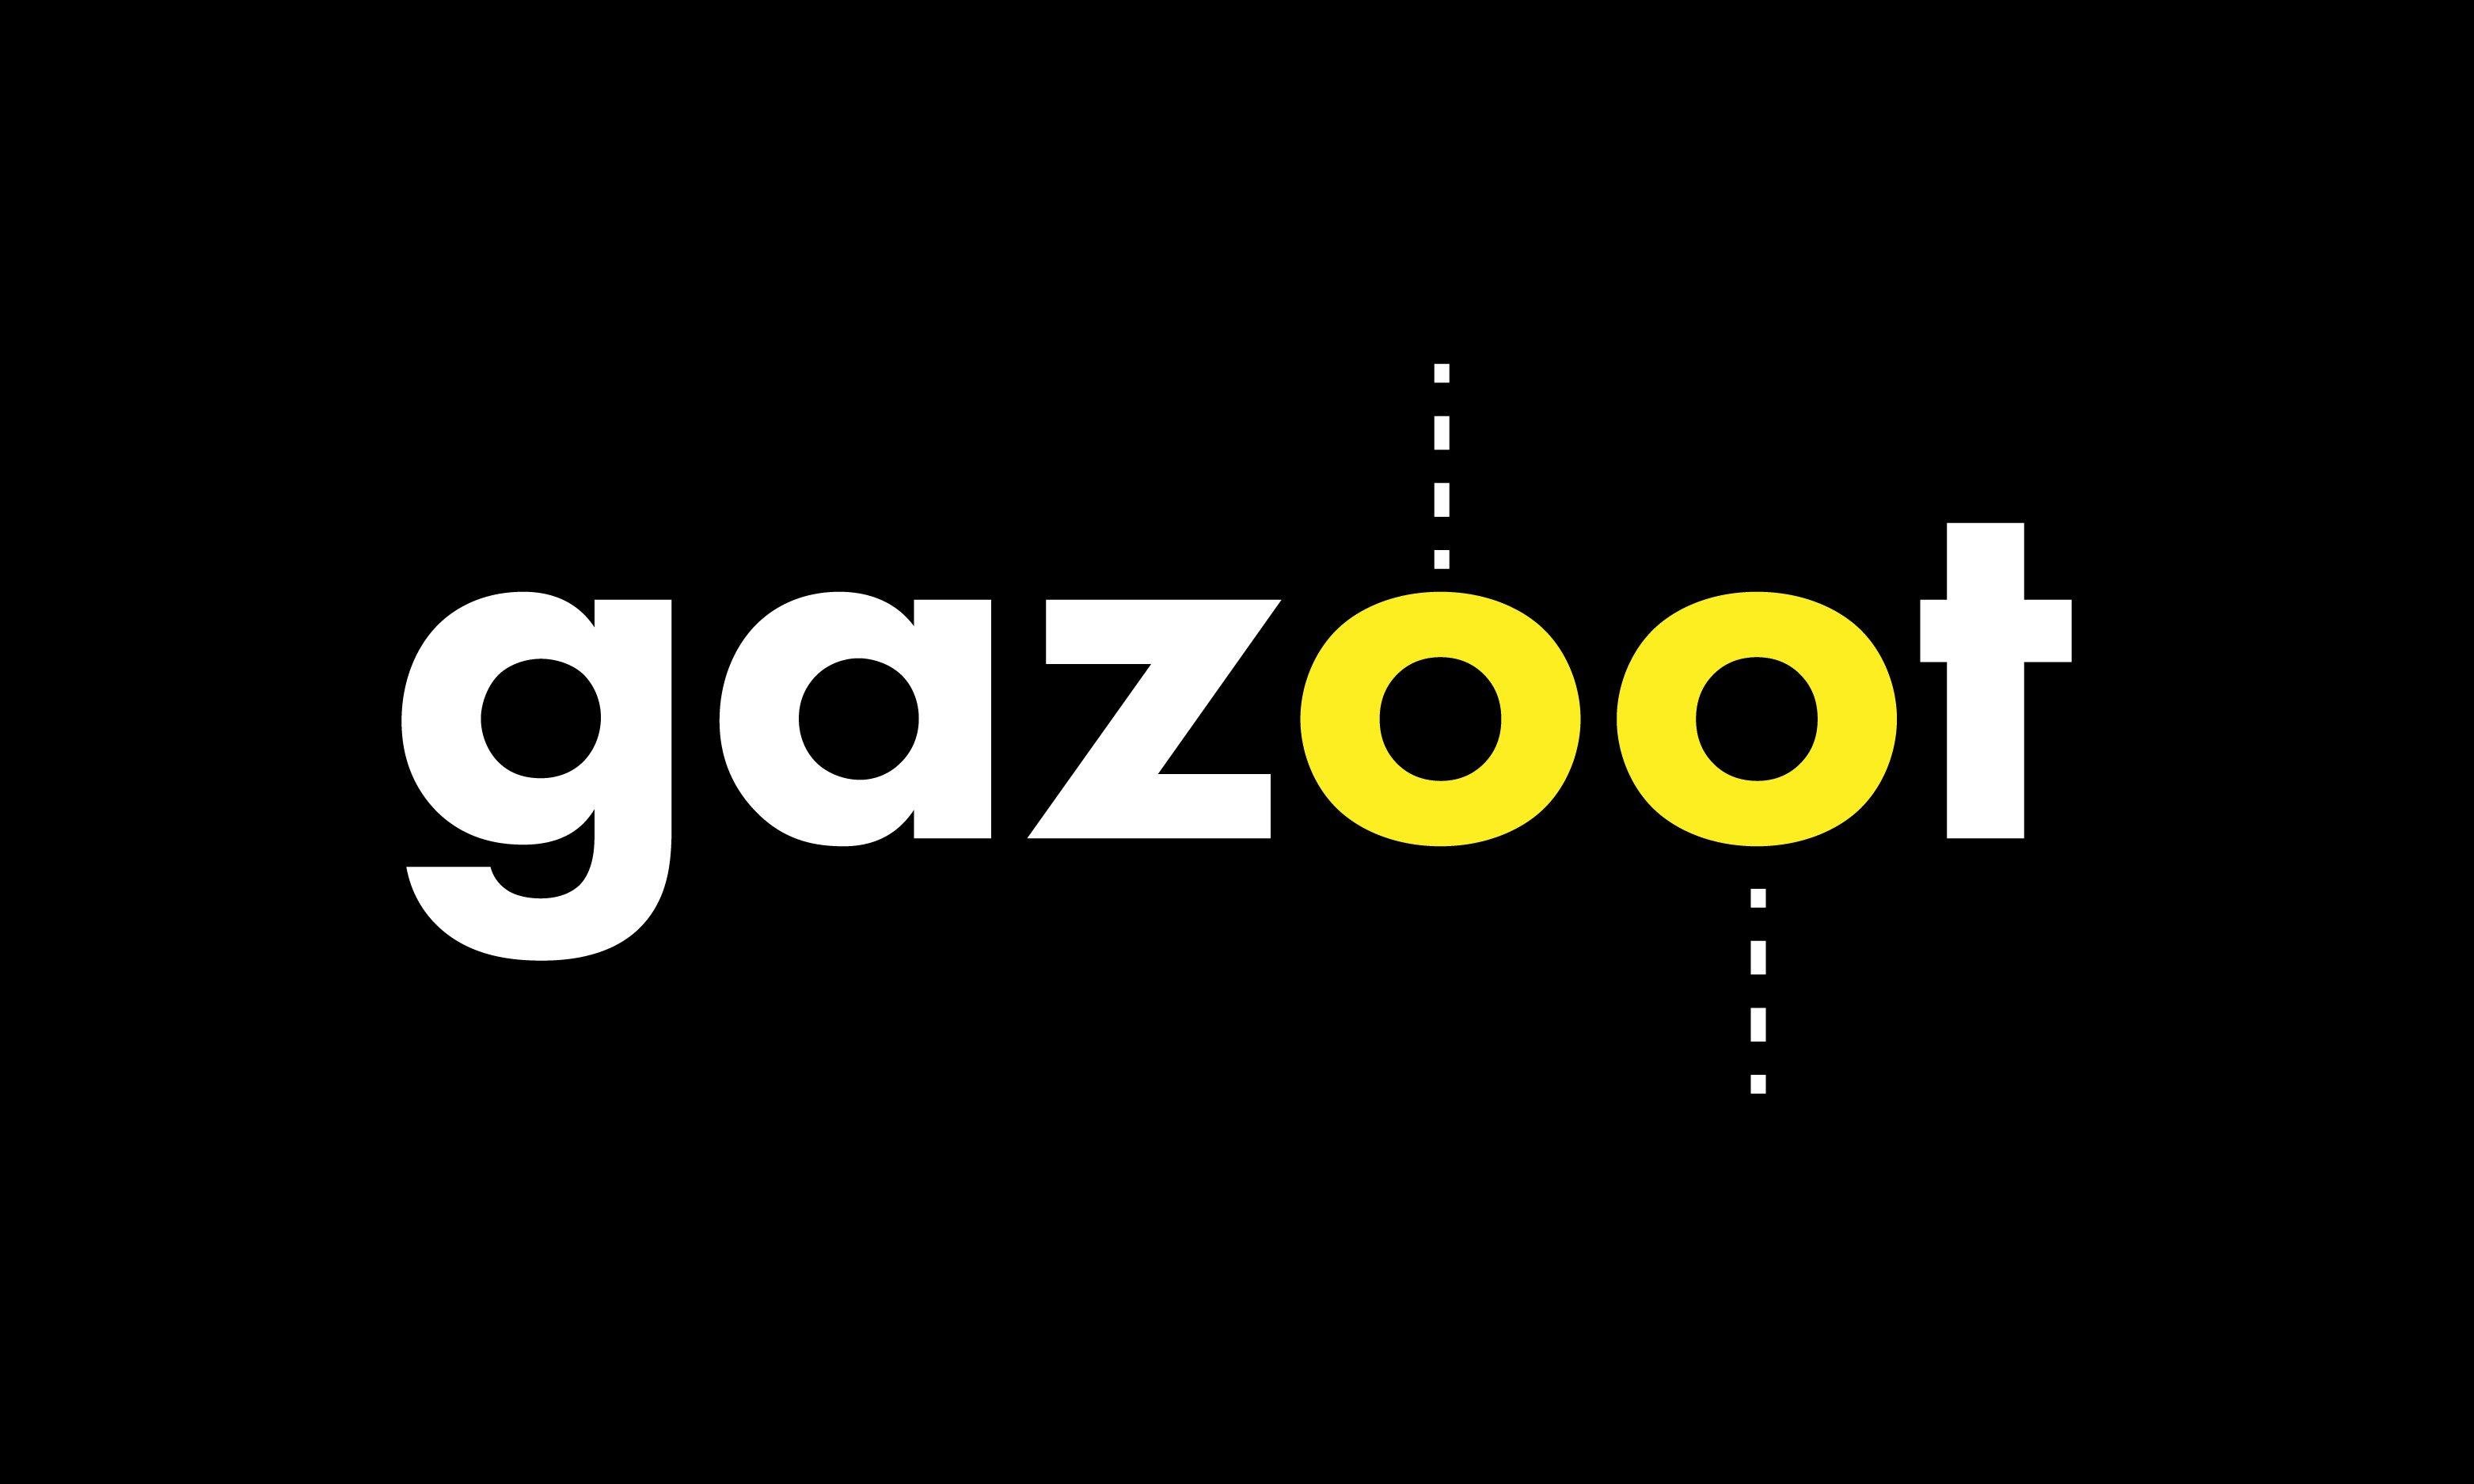 Gazoot.com